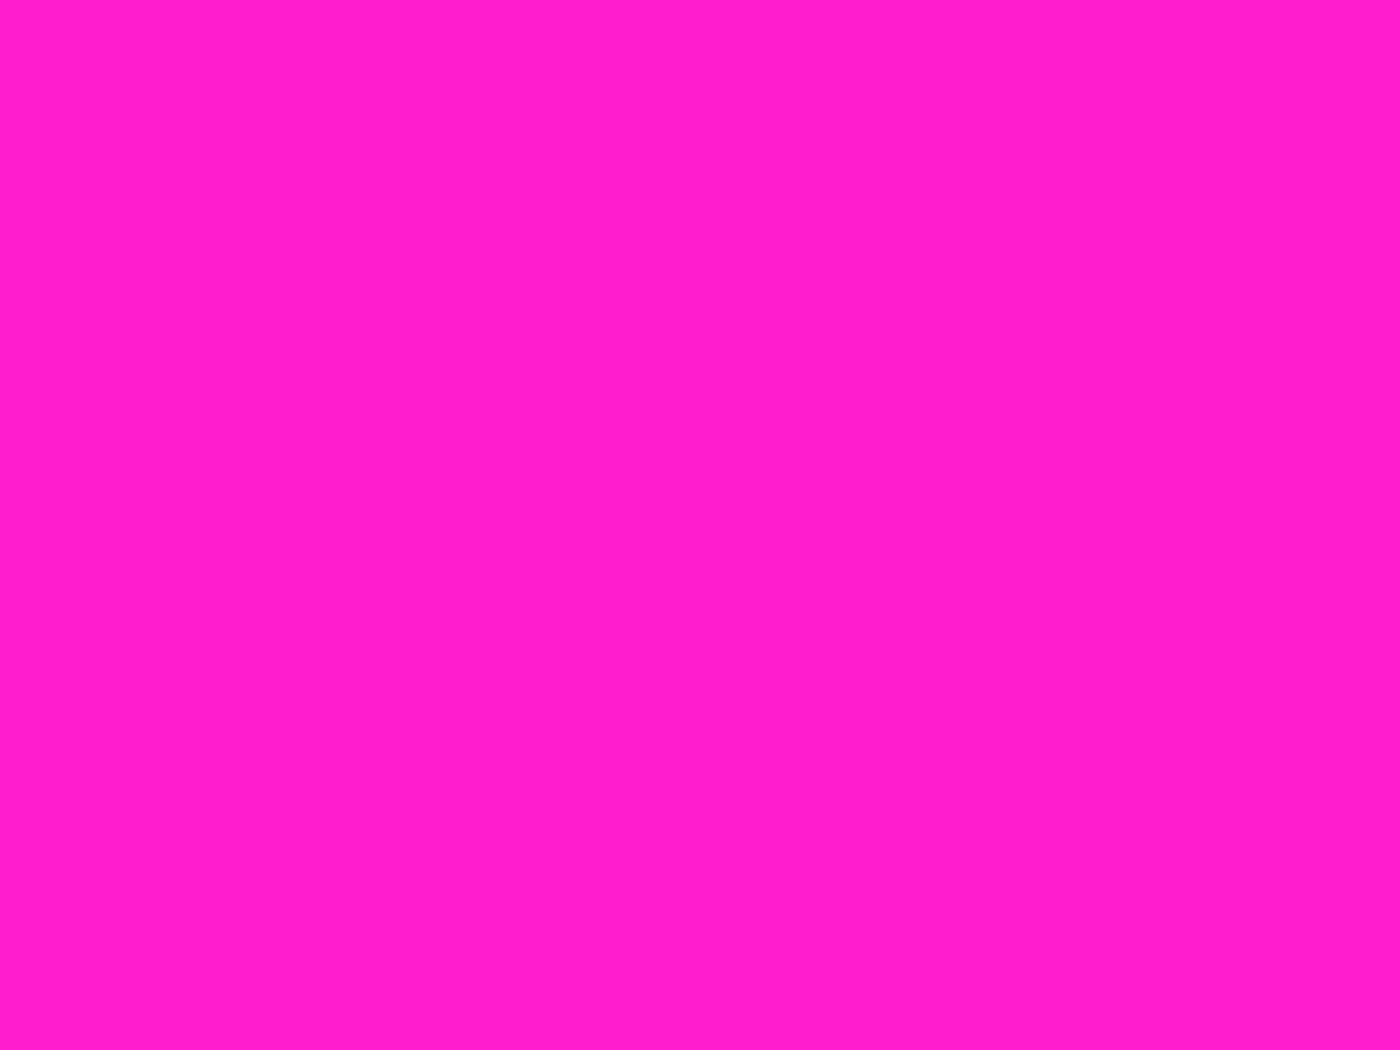 1400x1050 Hot Magenta Solid Color Background